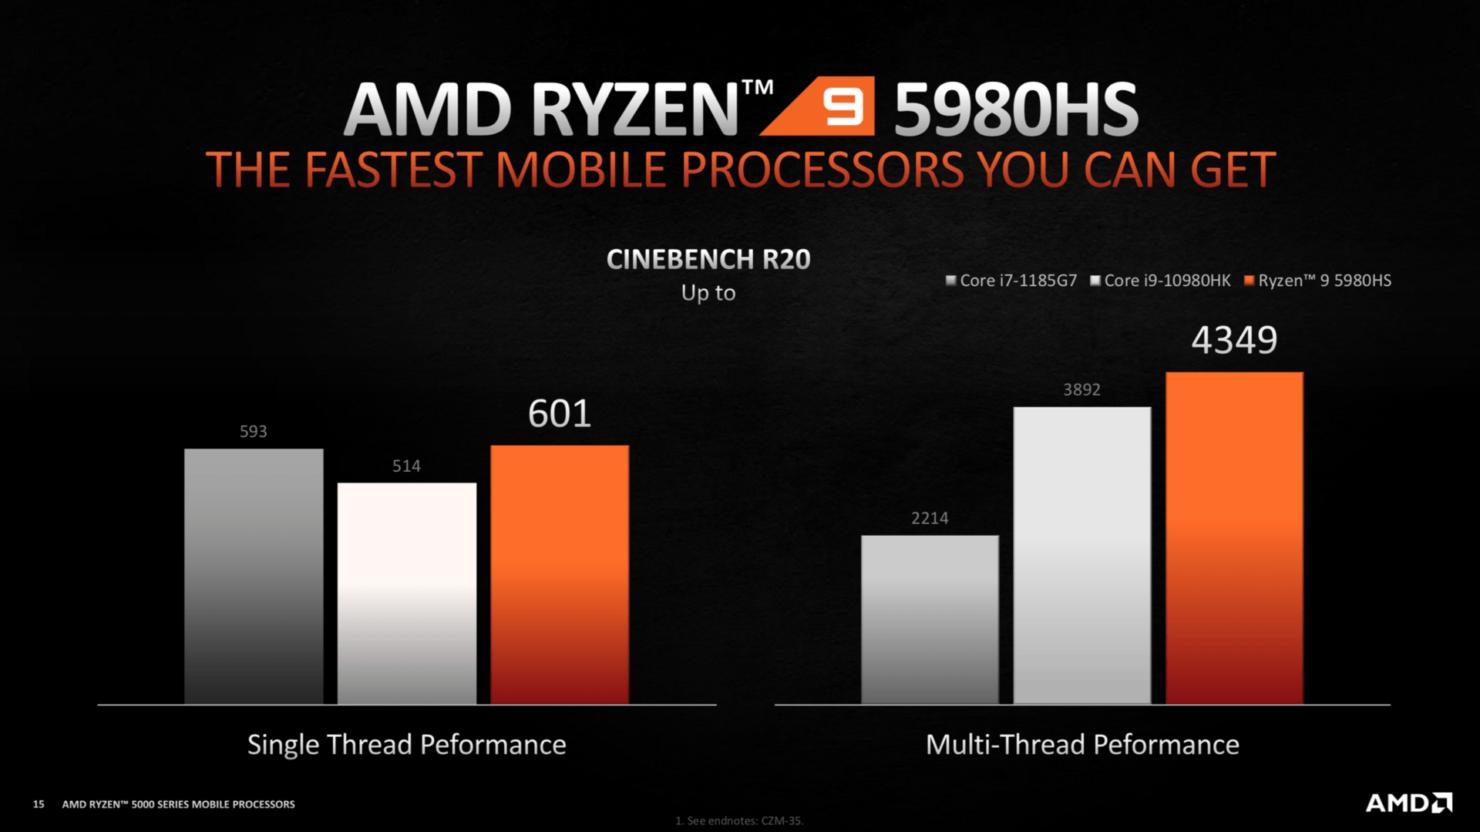 Sforum - AMD-Ryzen-5000-Zen-3-Notebook-CPUs-Cezanne-Lucienne-_4-1480x832-1 AMD Ryzen 5000 Mobile Series: Very Powerful, Supports Overlocking, But Beware If You Don't Choose Wrong !!!